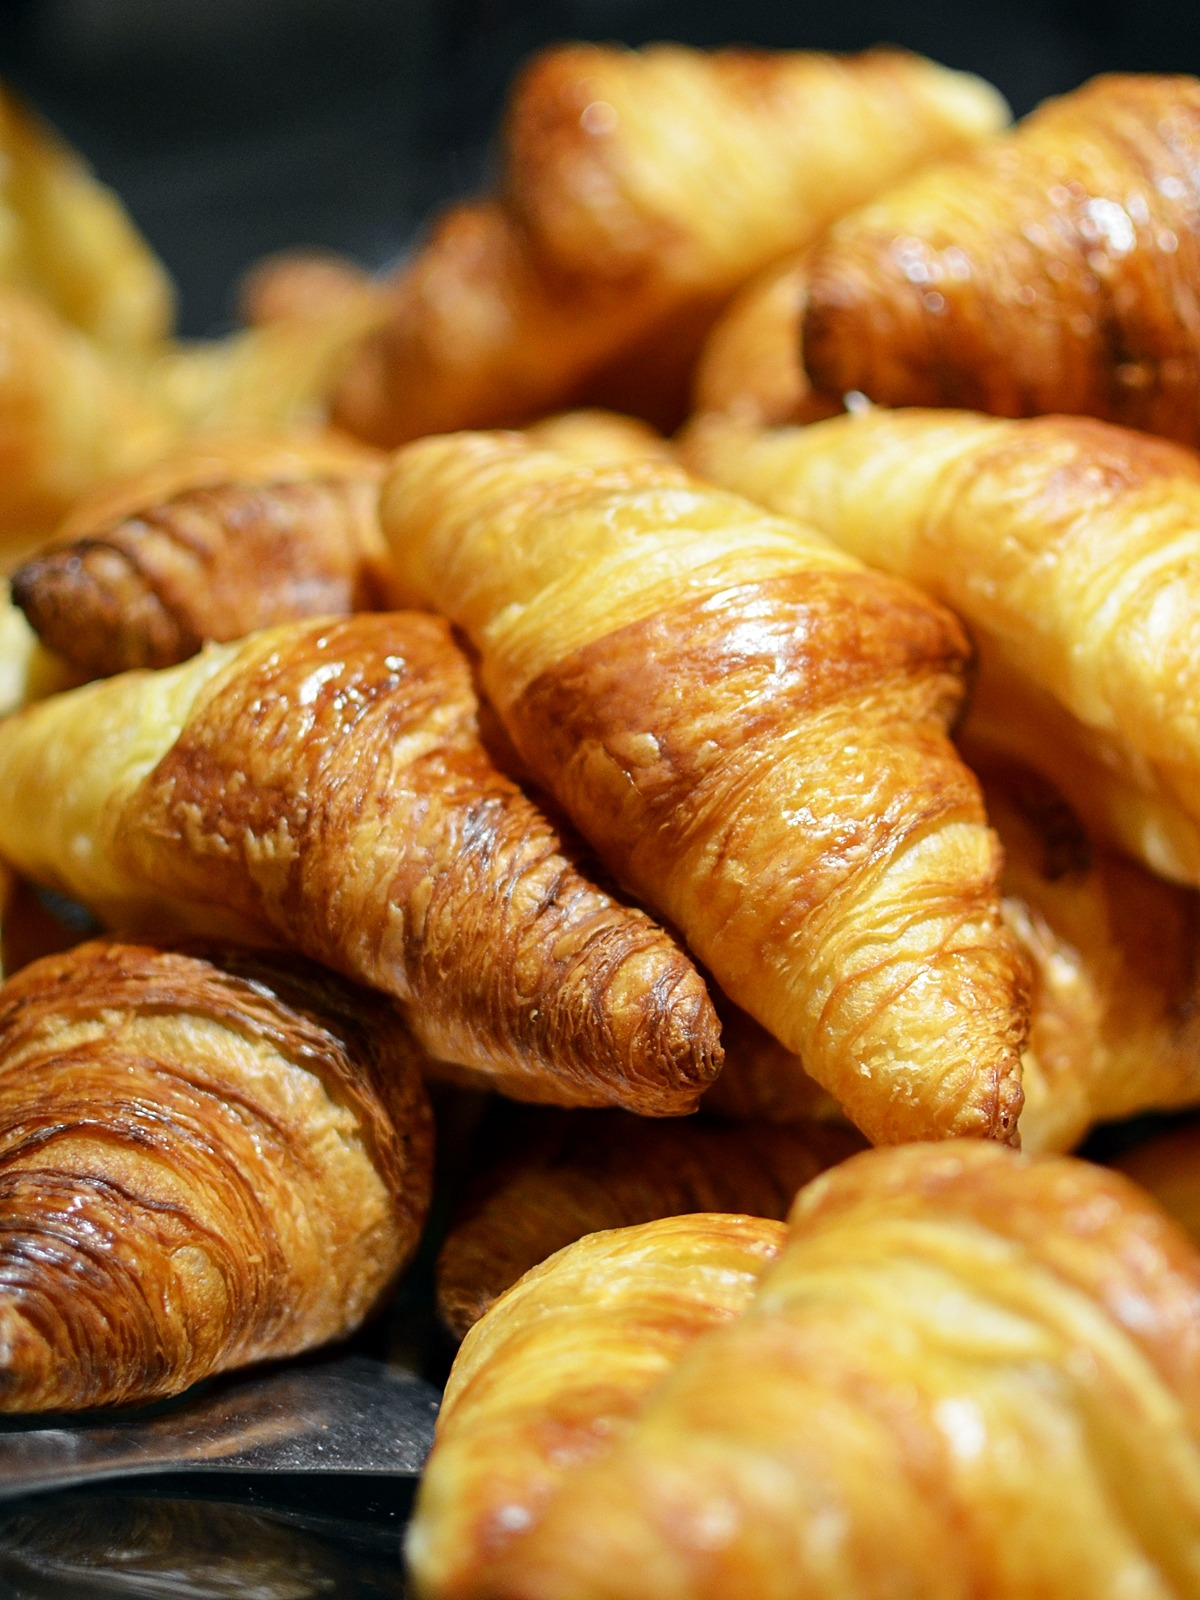 bakery-breakfast-croissant-2135